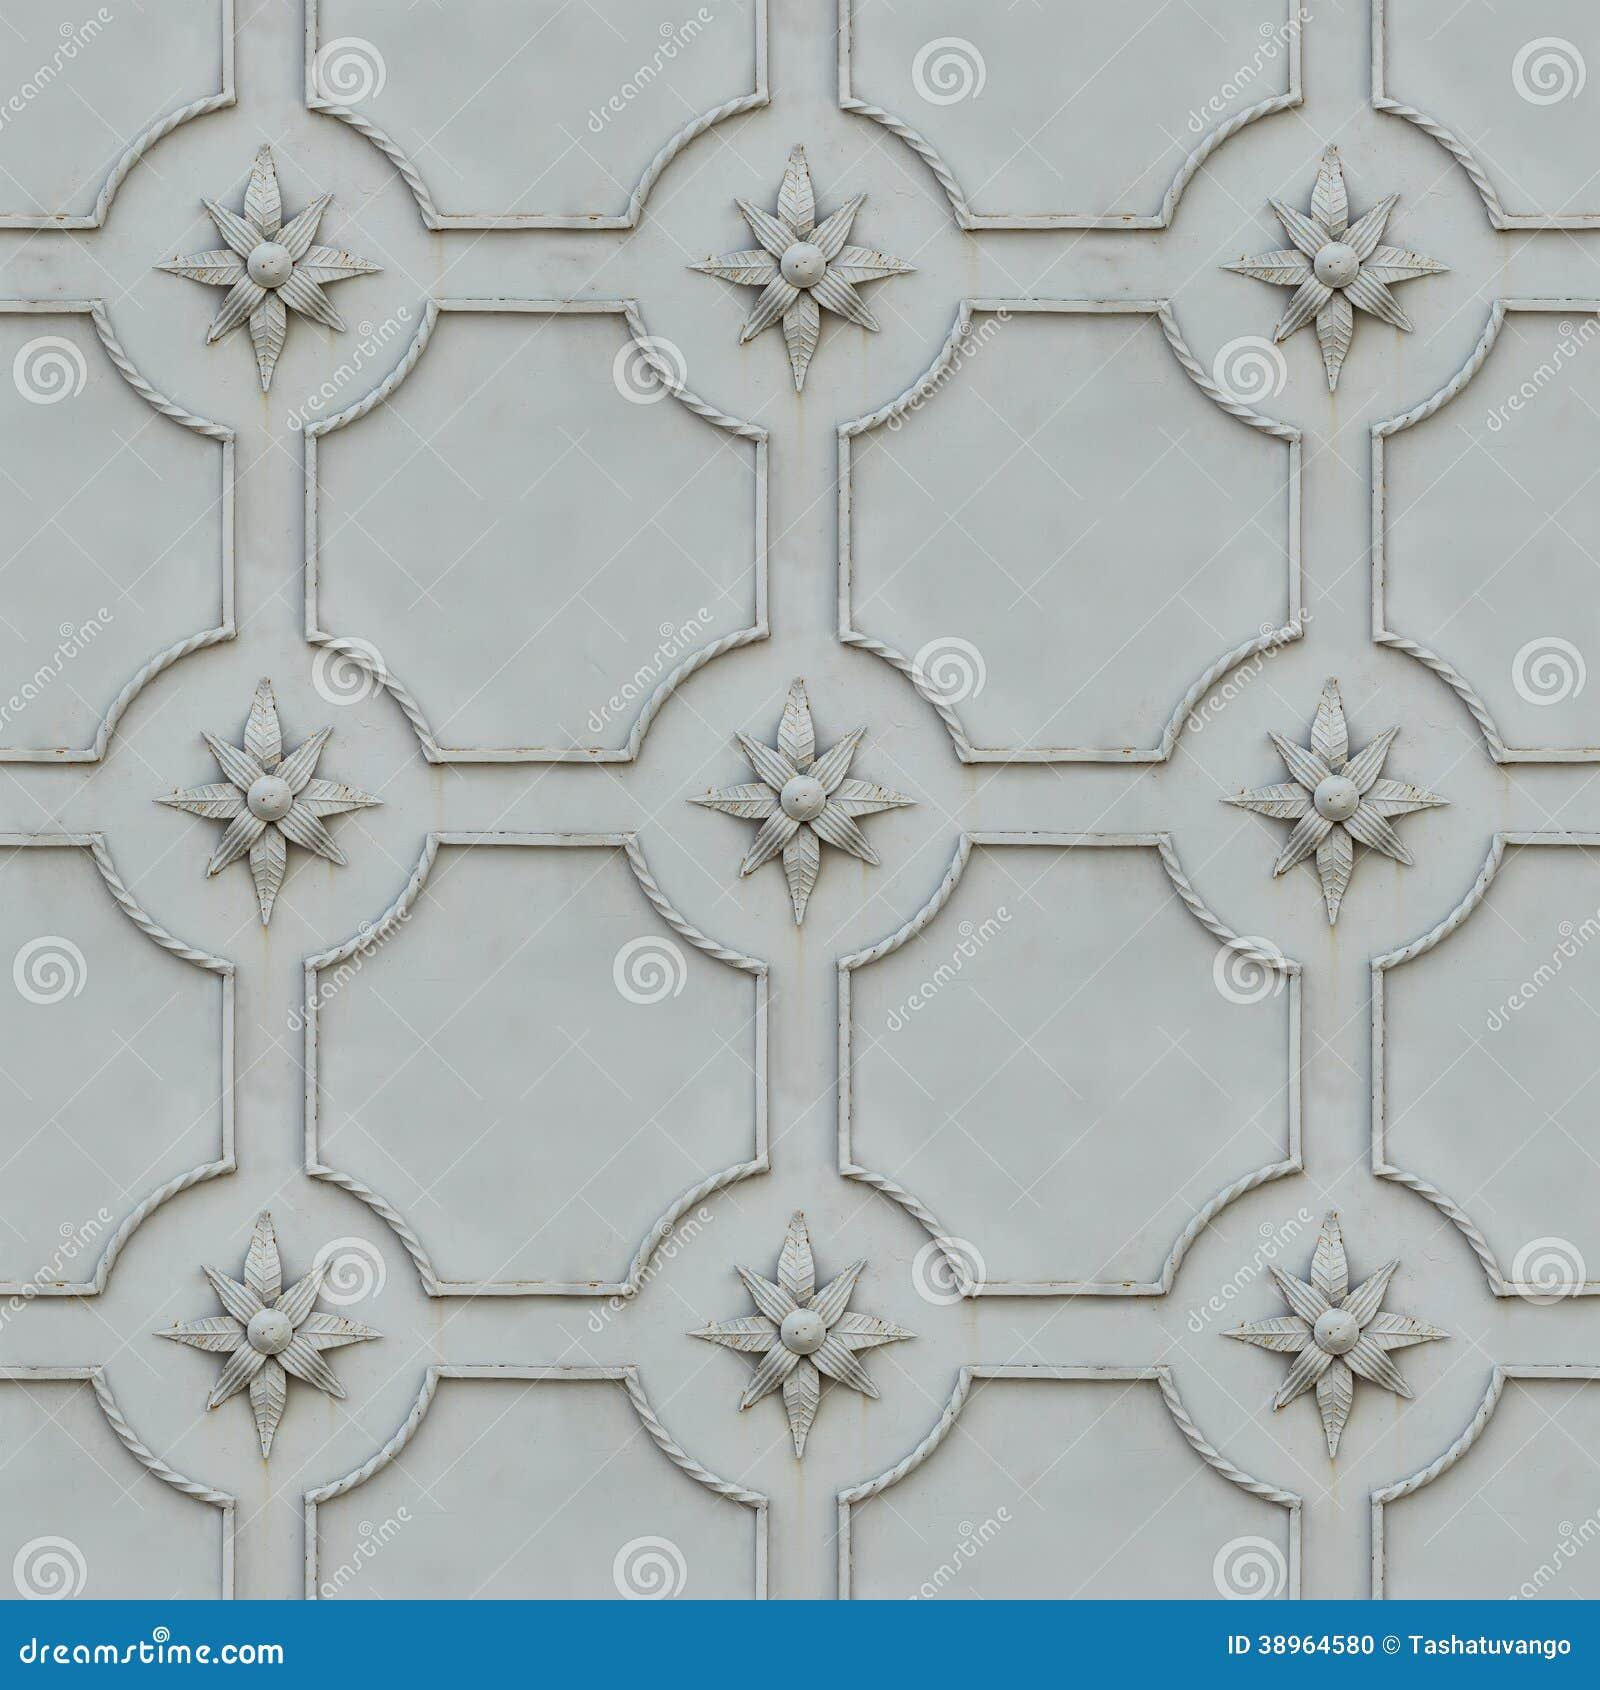 Wrought Iron Surface. Seamless Texture. Stock Photo ...  Wrought Iron Su...